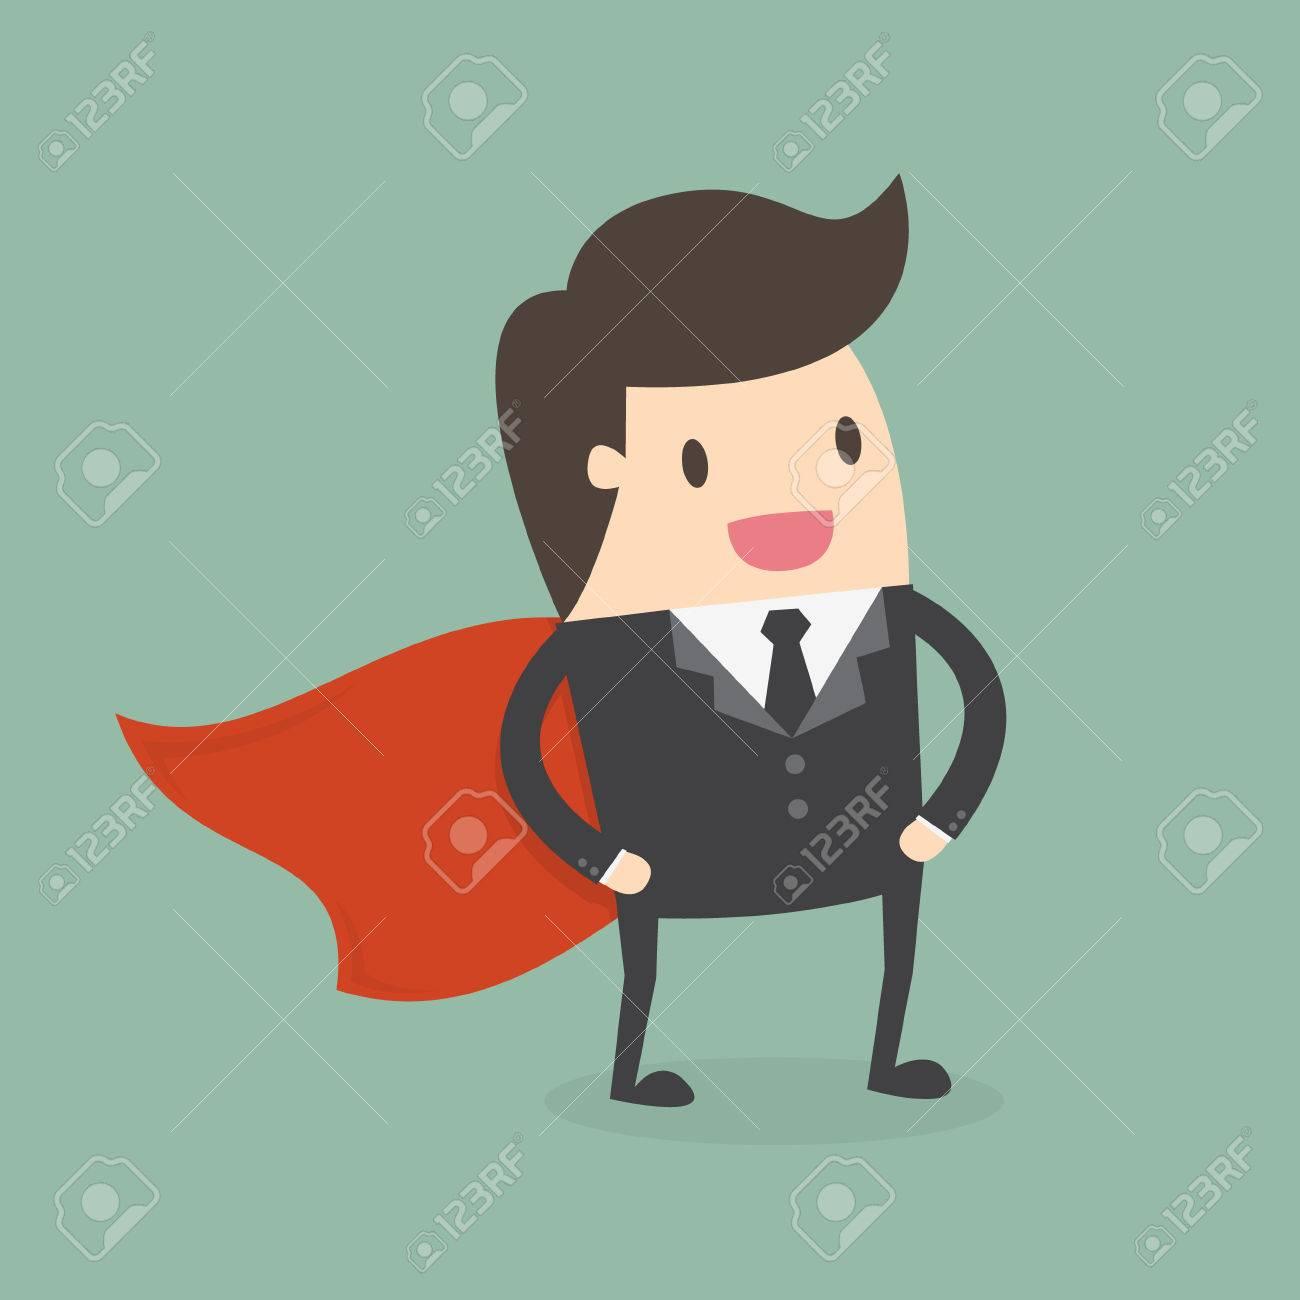 Super Businessman. Business concept illustration. - 55512338